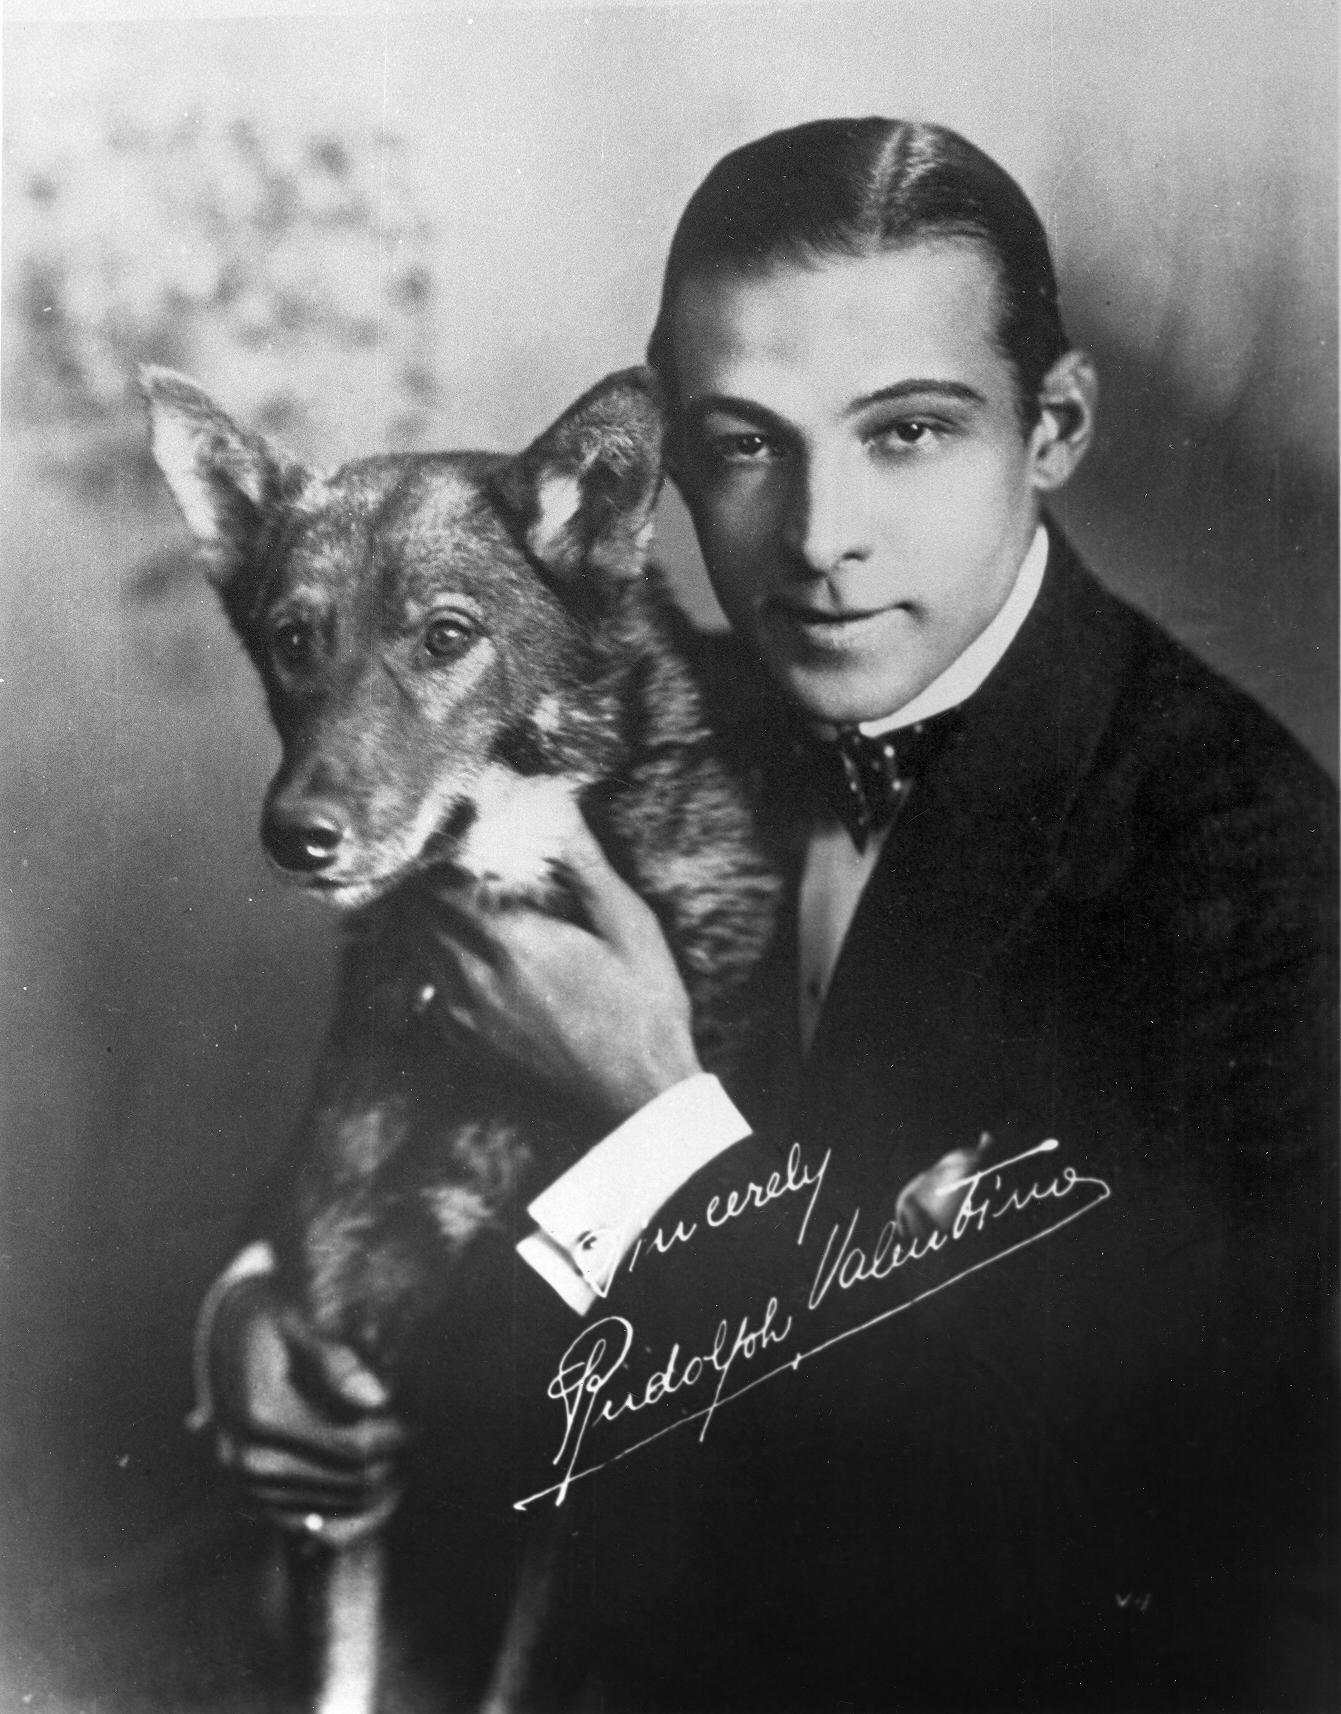 Rudolph Valentino filmography - Wikipedia